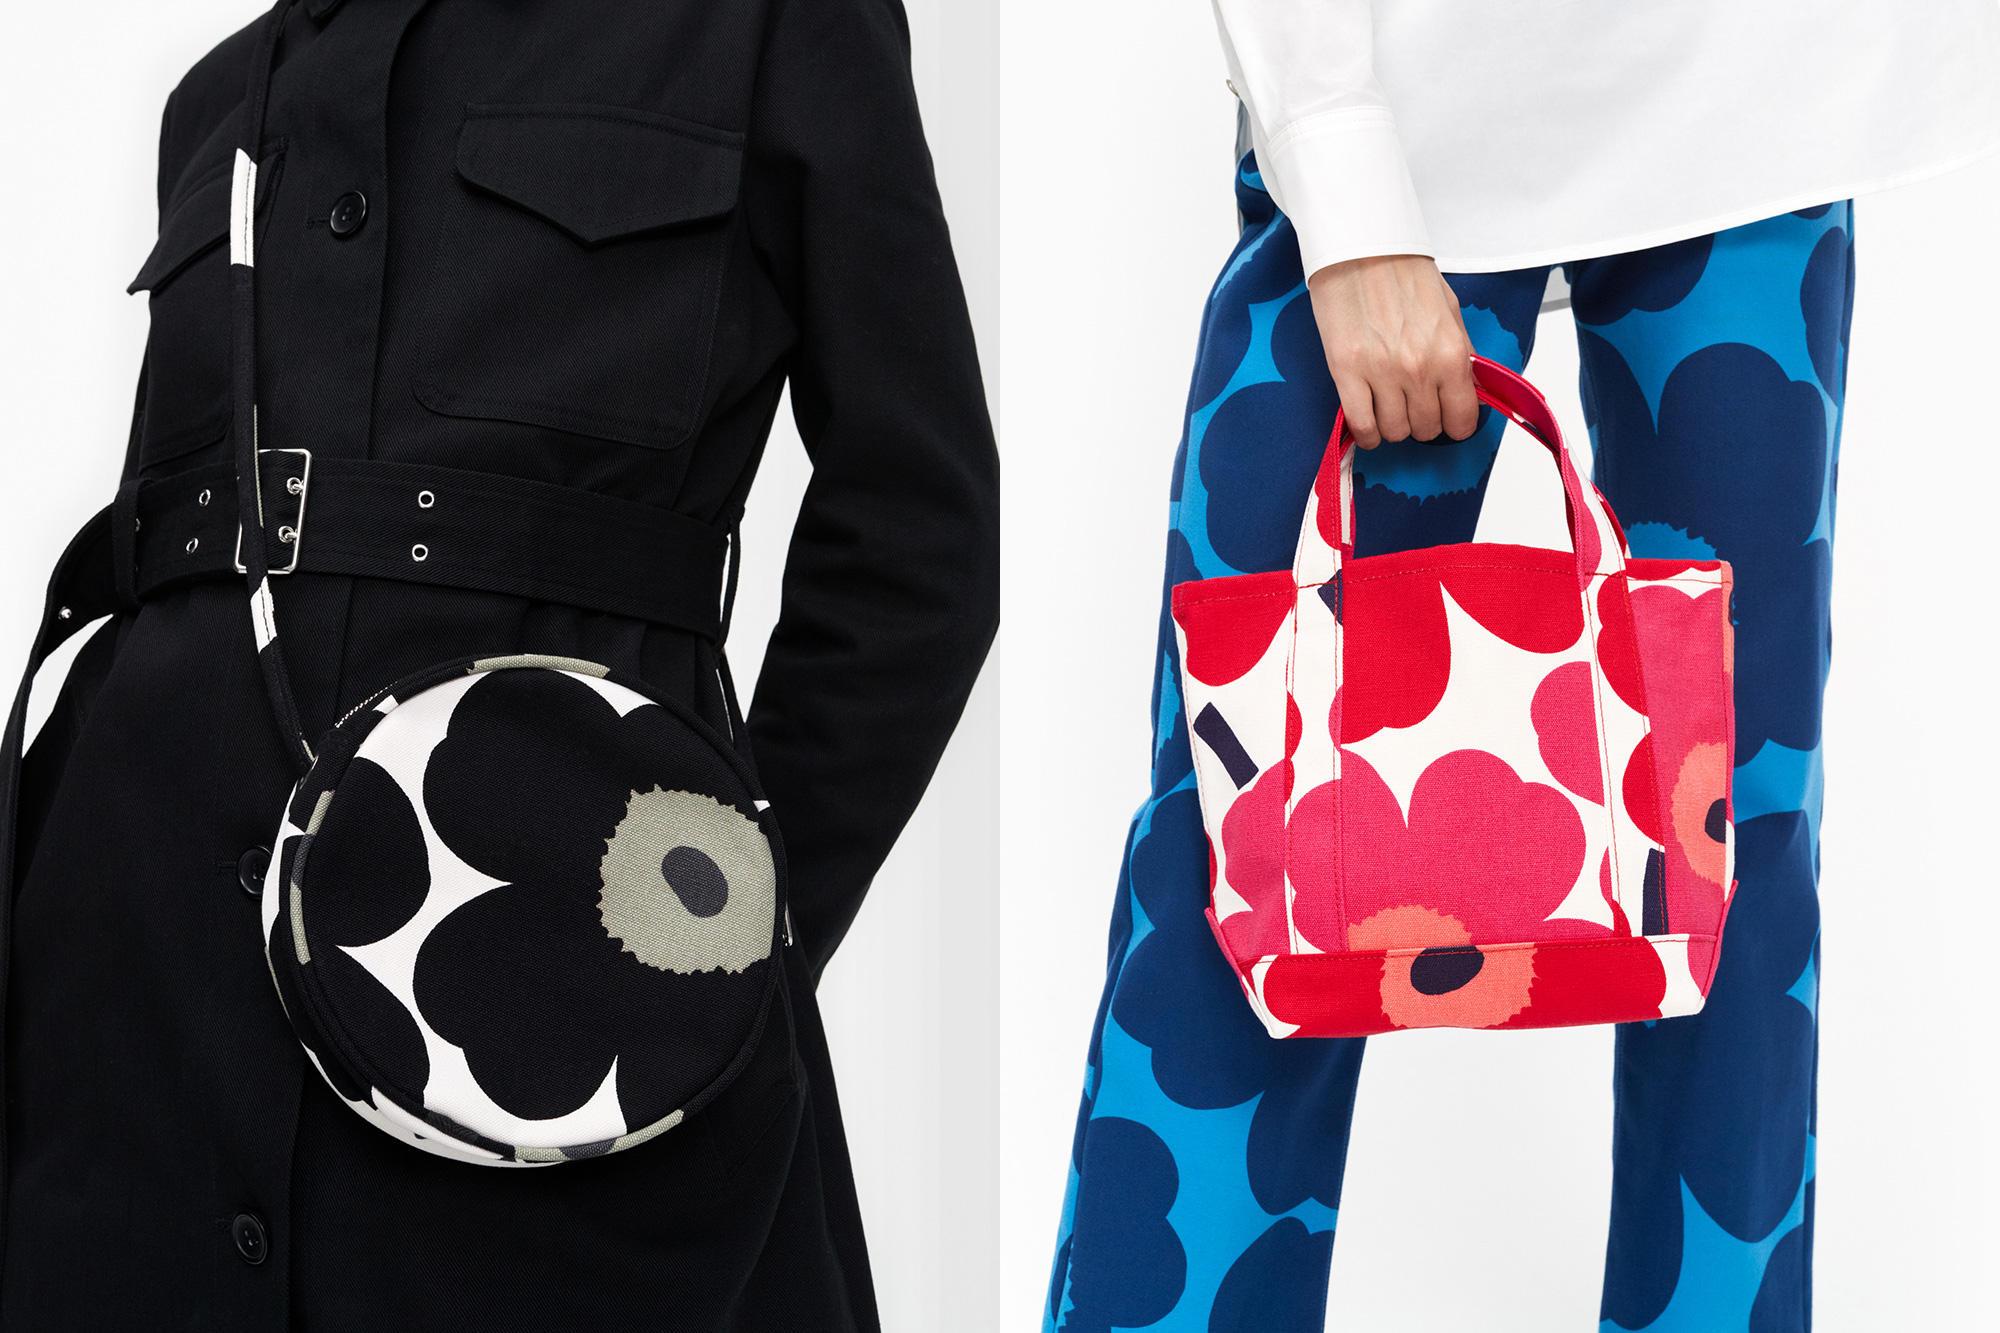 1.17- New Unikko Bags